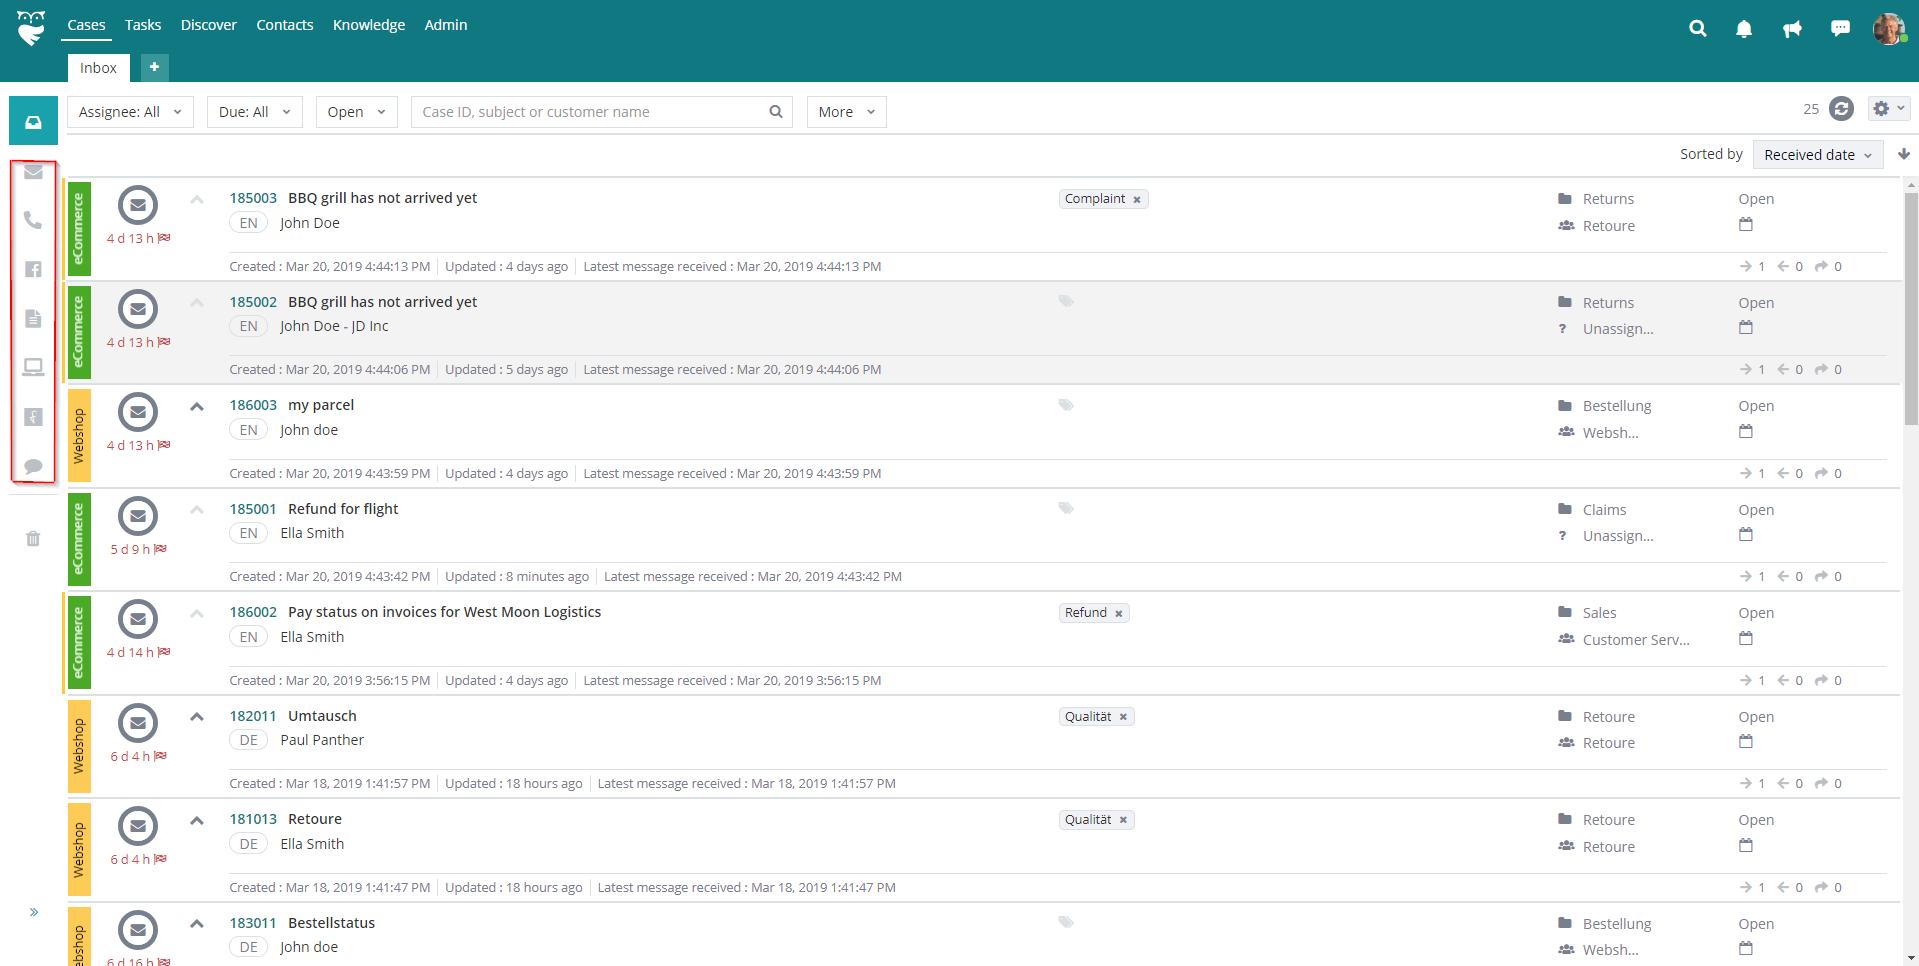 Digital Impatience Blog_ThinkOwl-Multichannel Inbox View